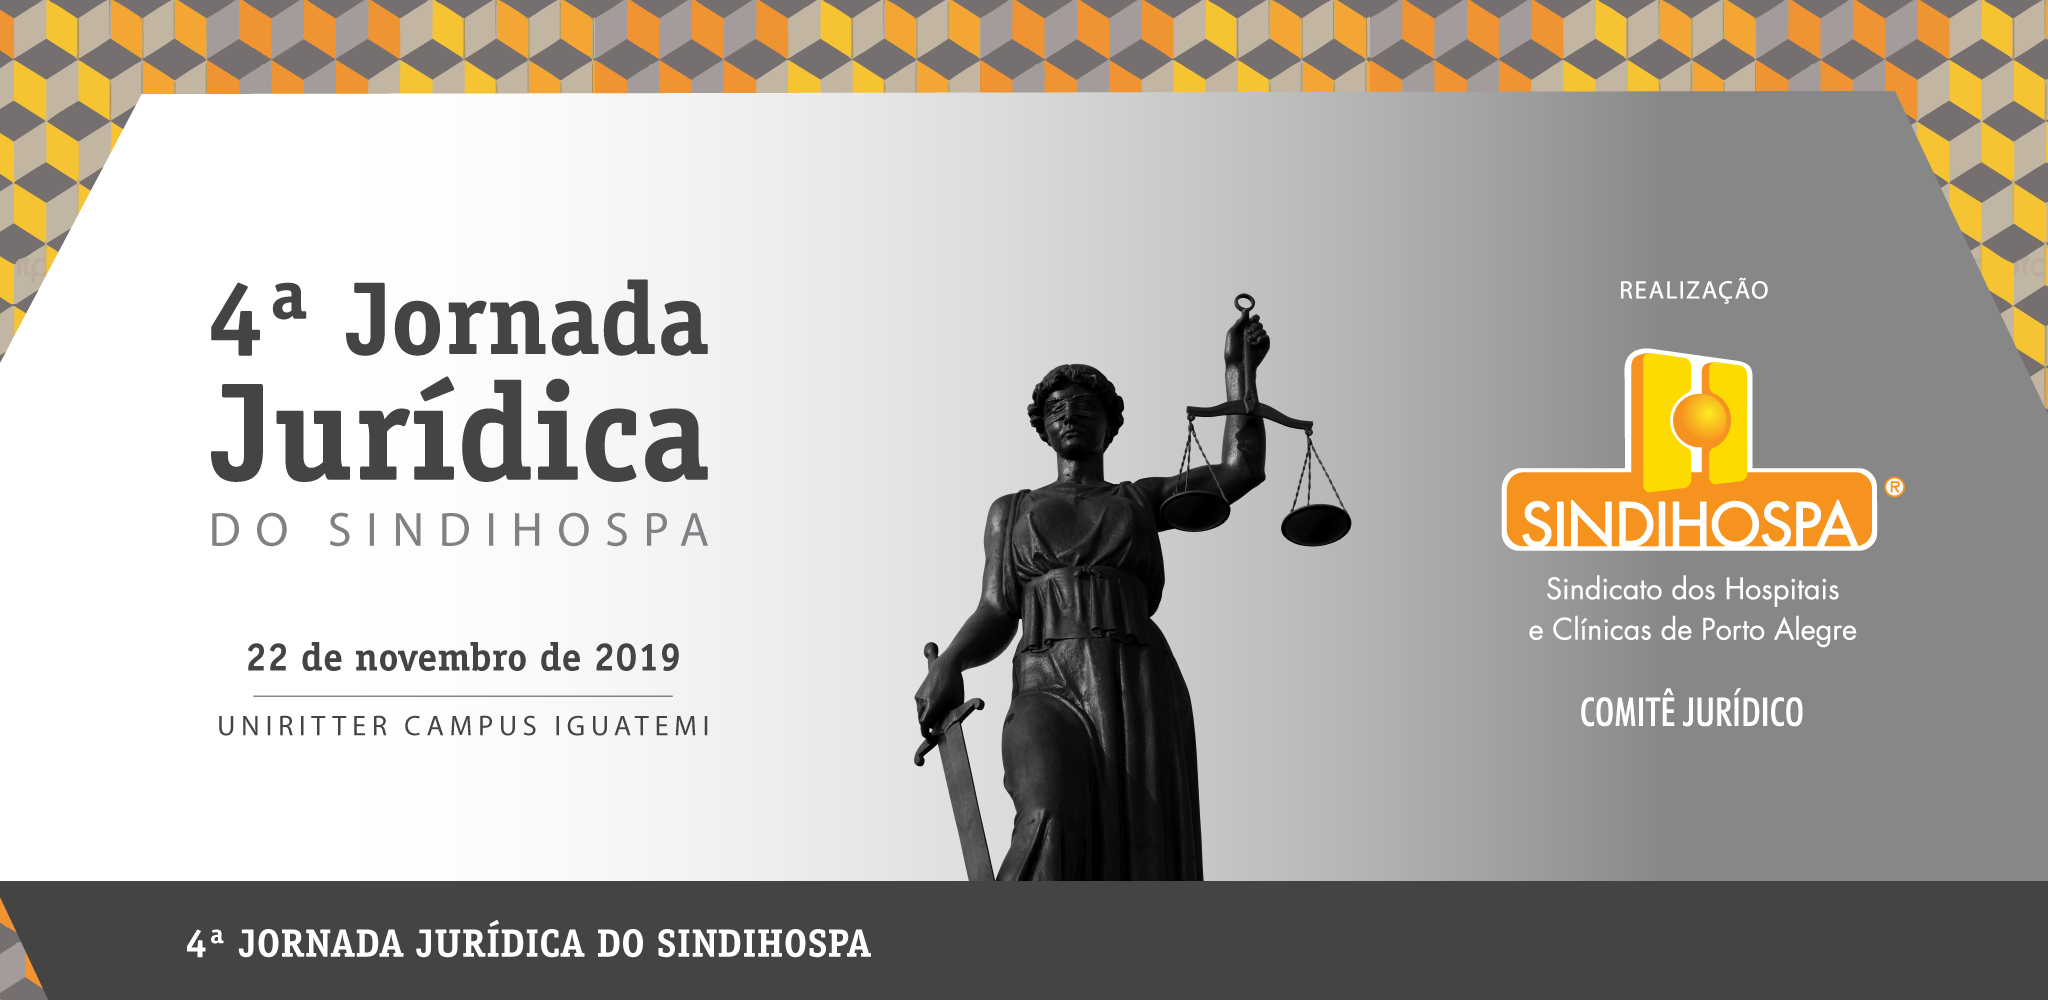 4ª Jornada Jurídica do SINDIHOSPA